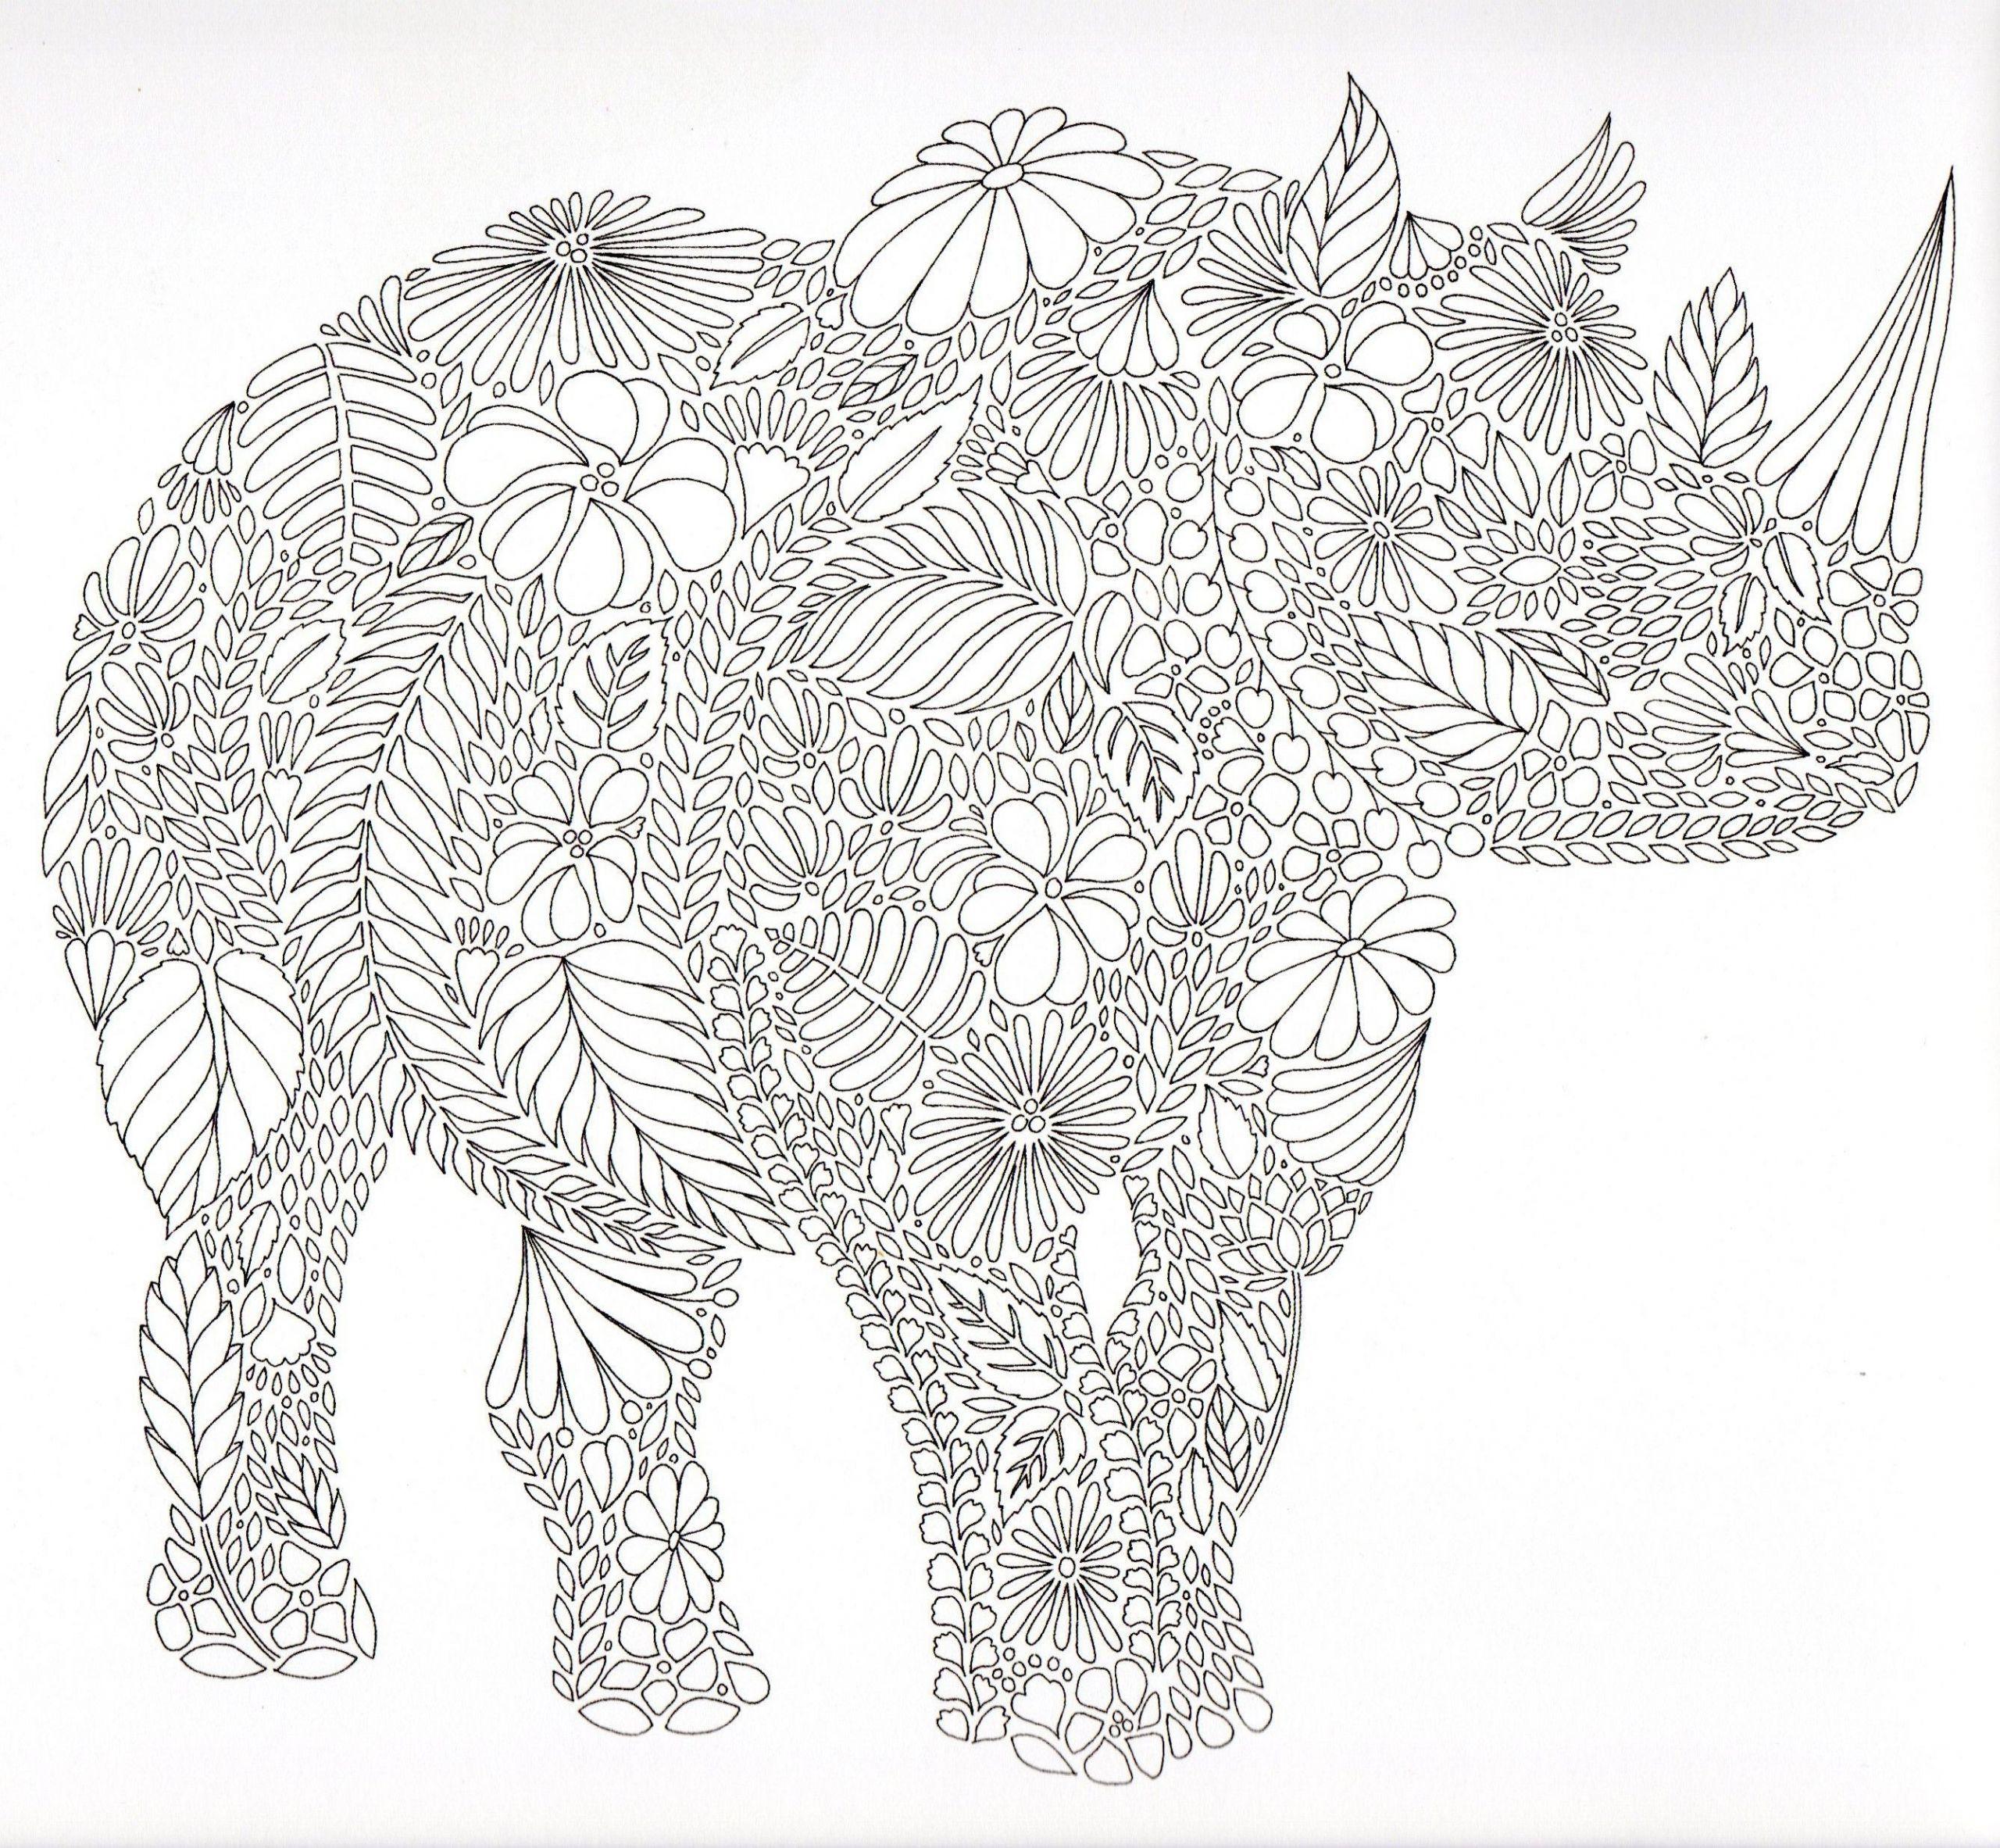 Die Besten Von Erwachsenen Mandala Kostenlos Animal Coloring Pages Elephant Coloring Page Coloring Books